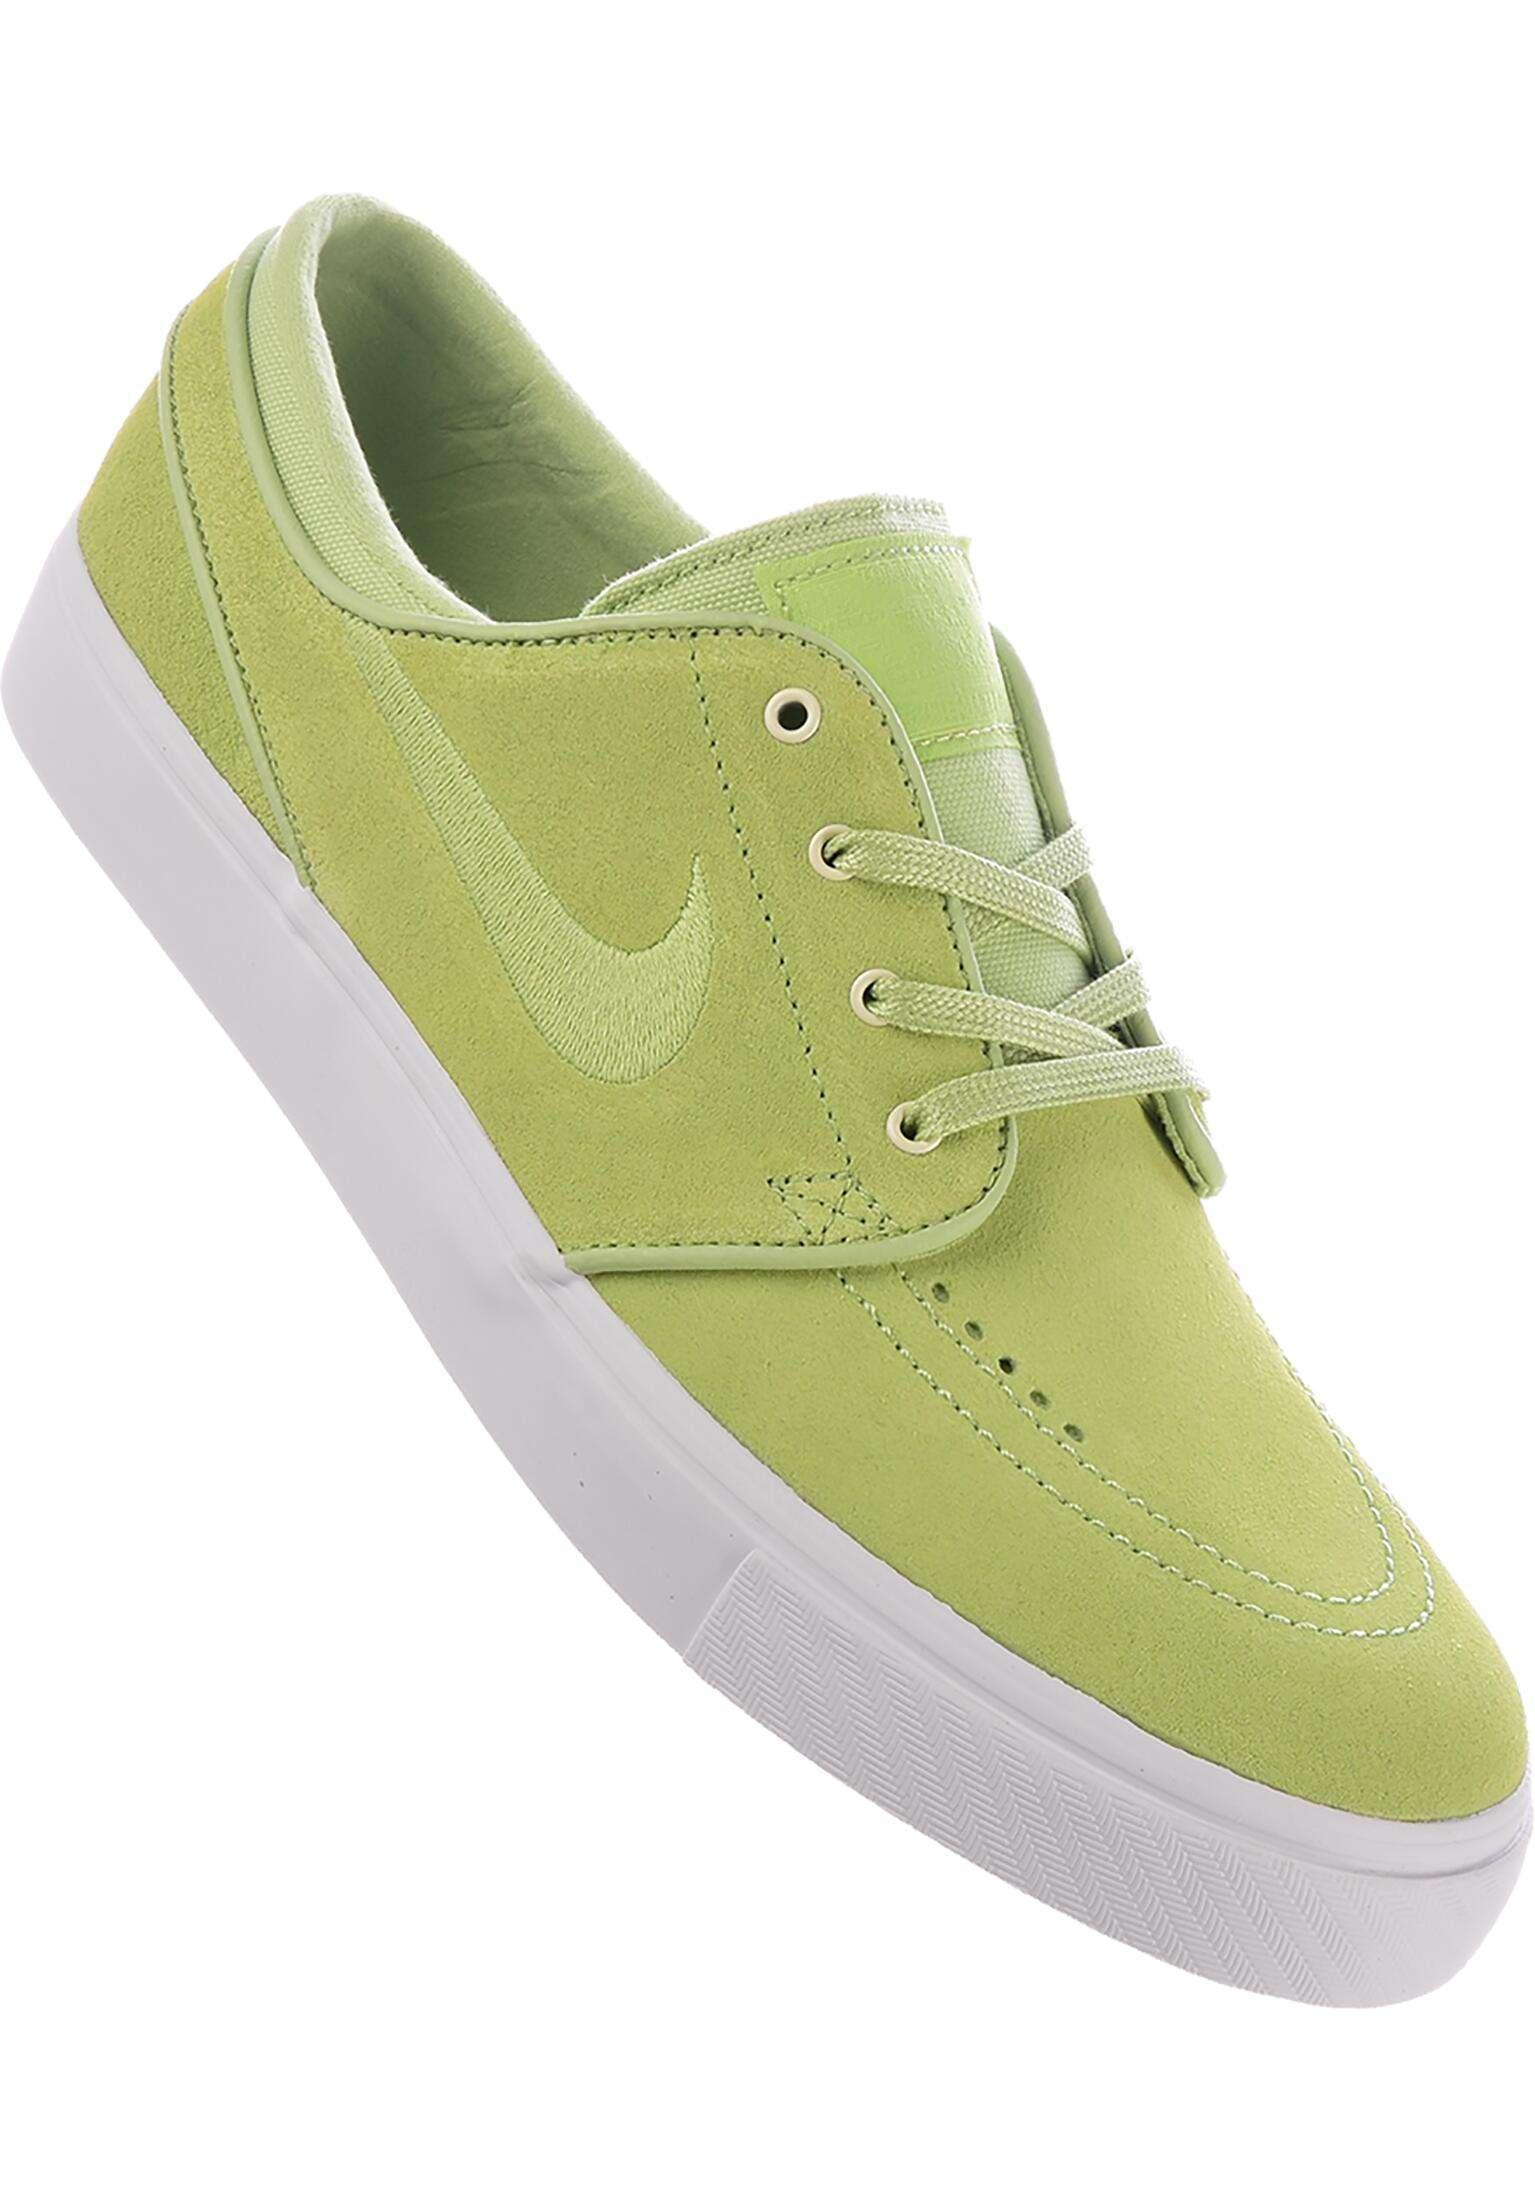 uk availability fb1f7 efcd0 Zoom Stefan Janoski Nike SB All Shoes in barleyvolt-white for Men   Titus